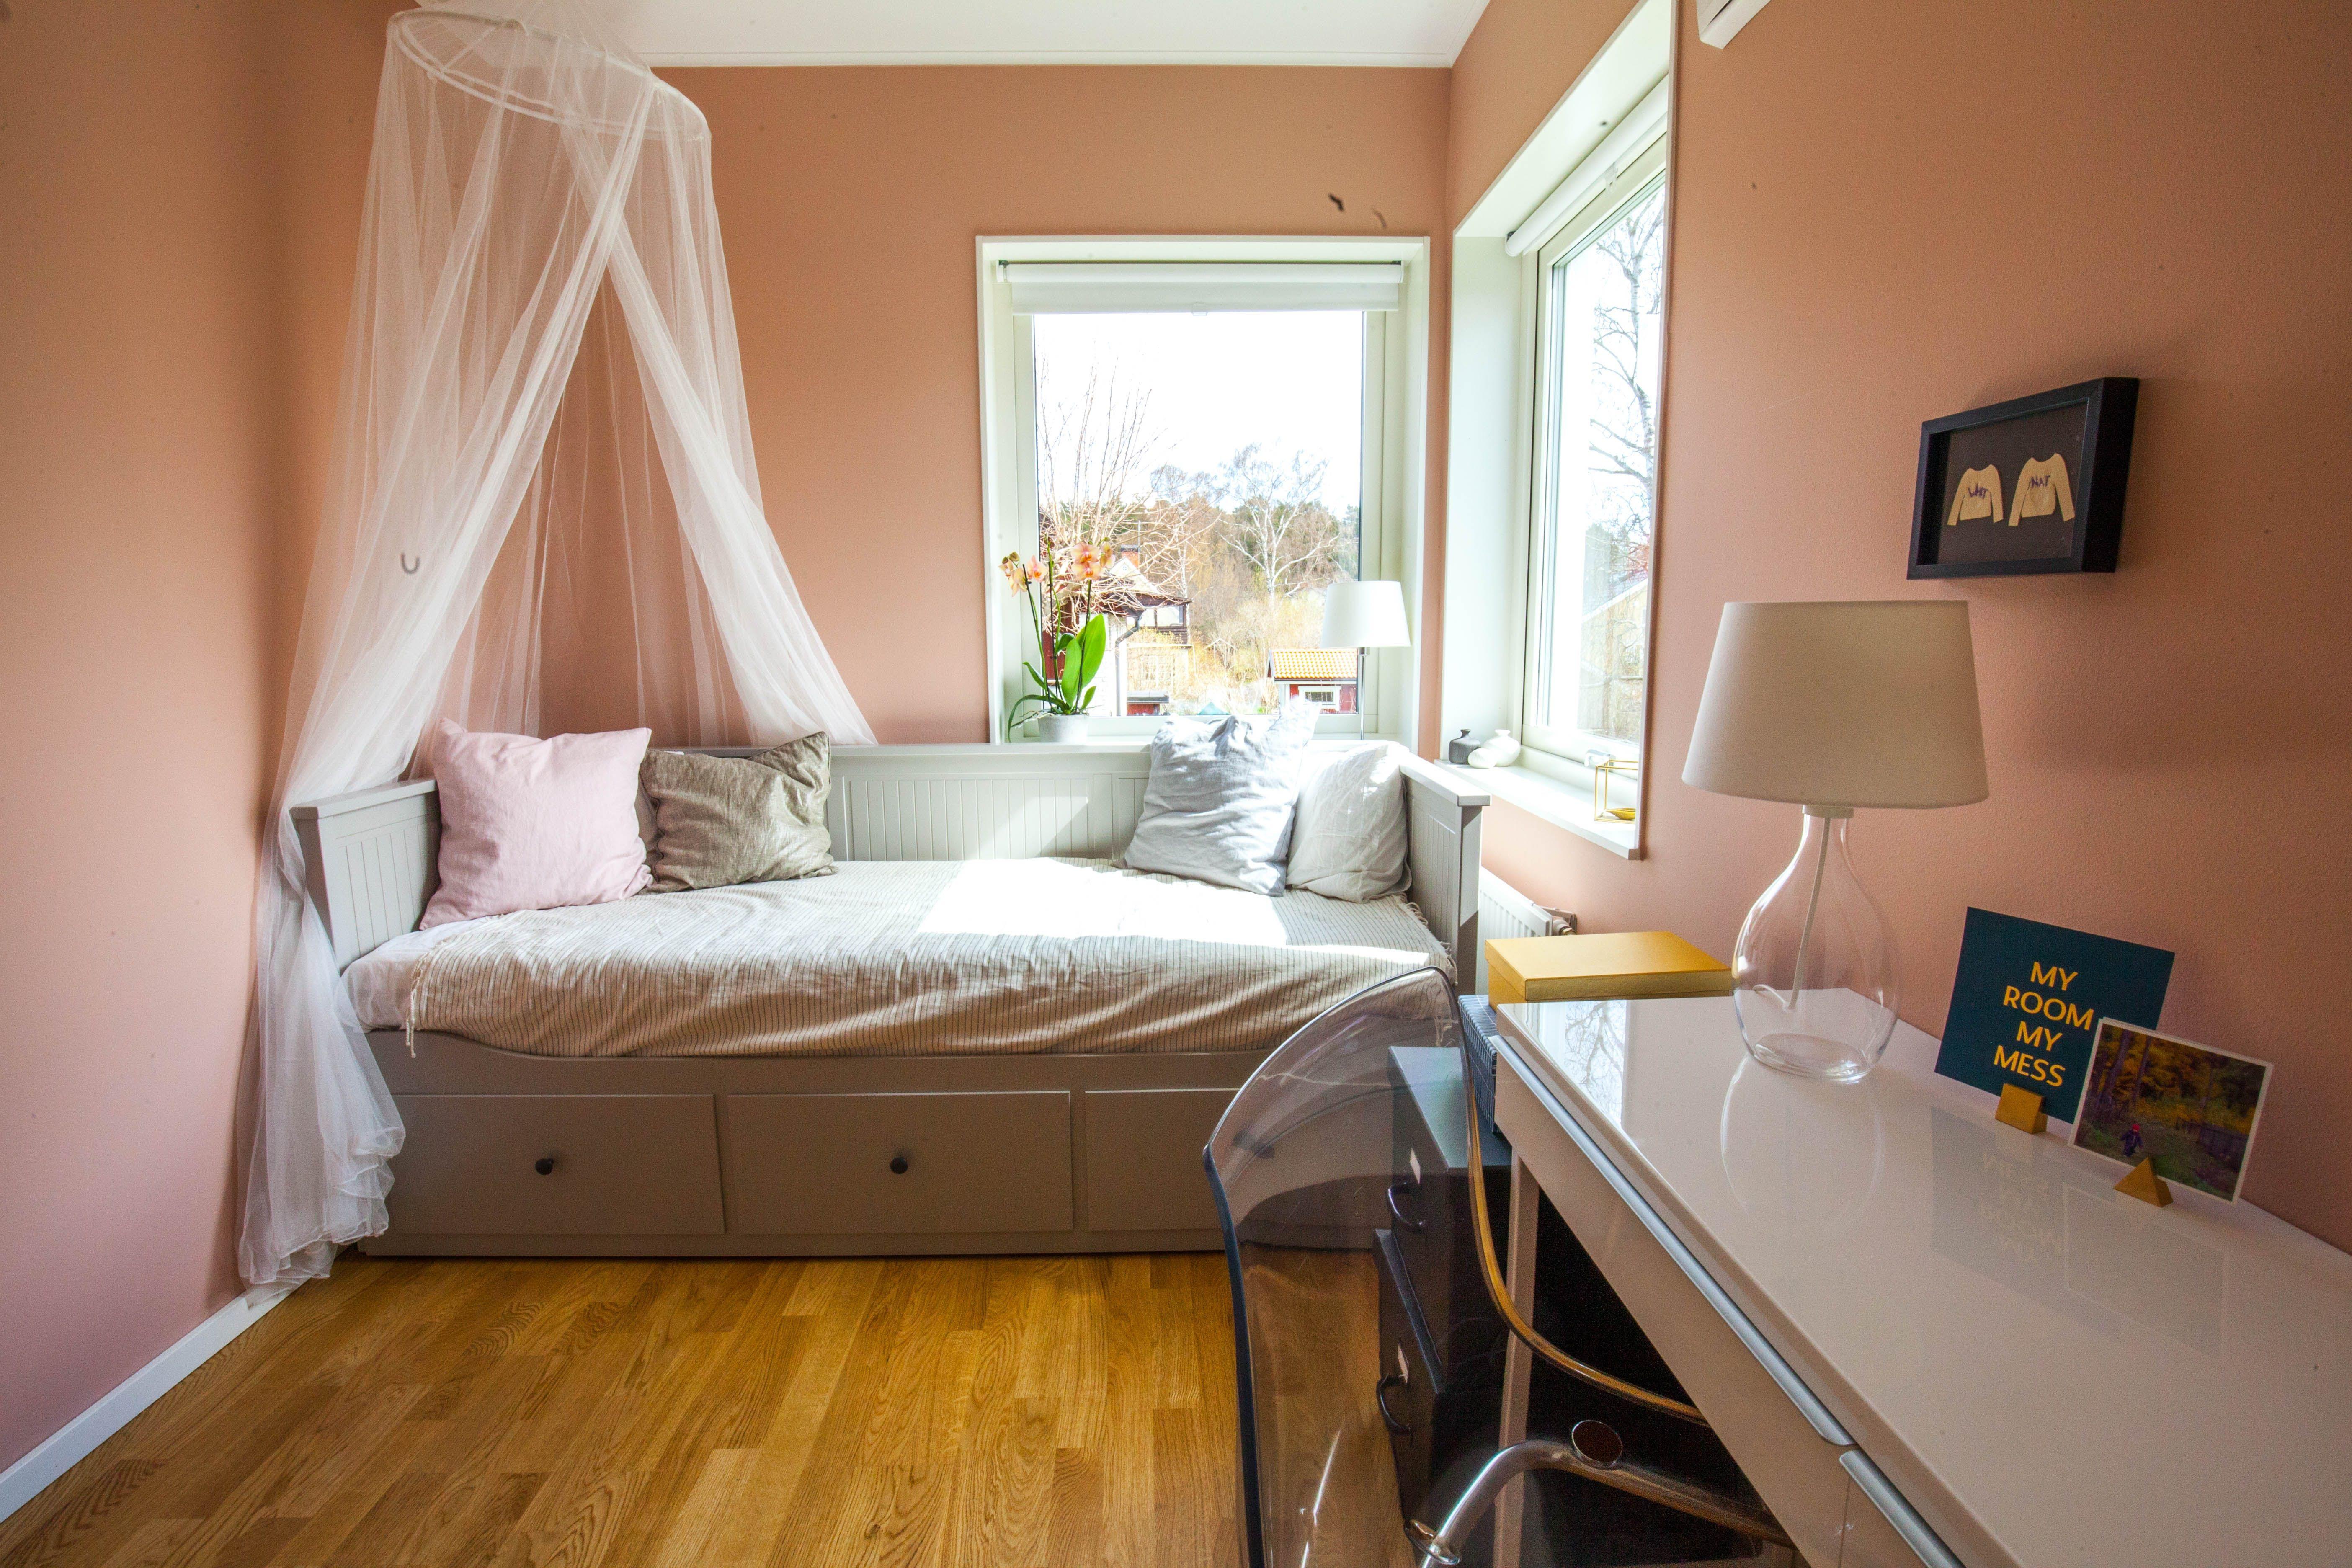 Get The Look Playful Minimal Scandinavian Style Apartment Therapystudio